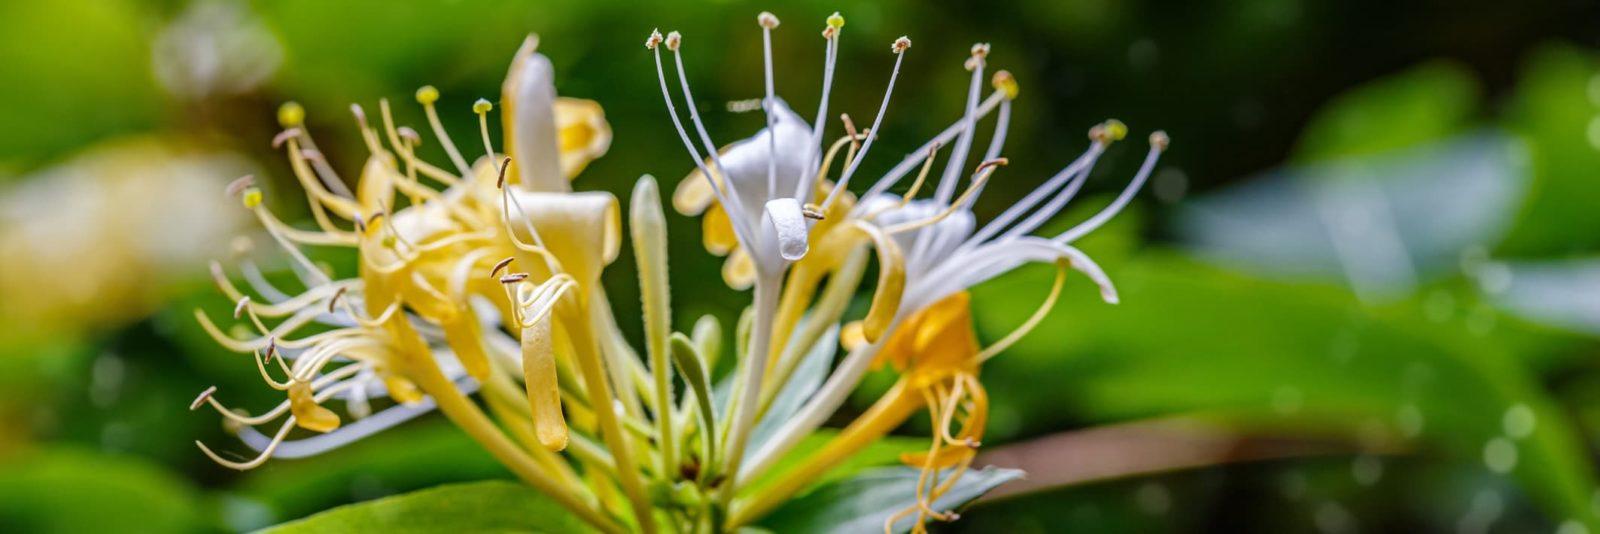 lonicera honeysuckle closeup